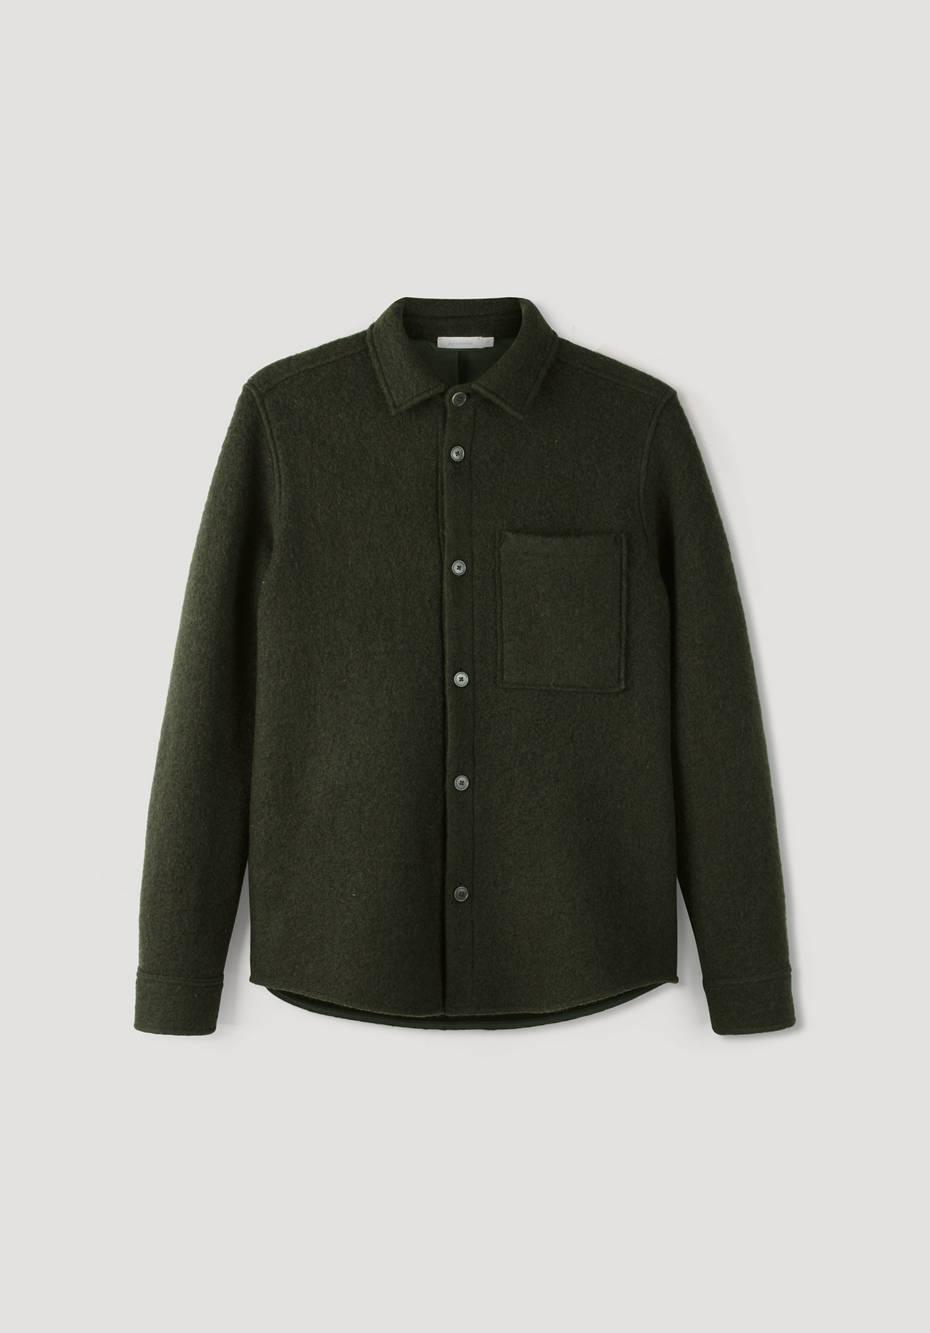 Shirt jacket made of virgin wool with organic cotton